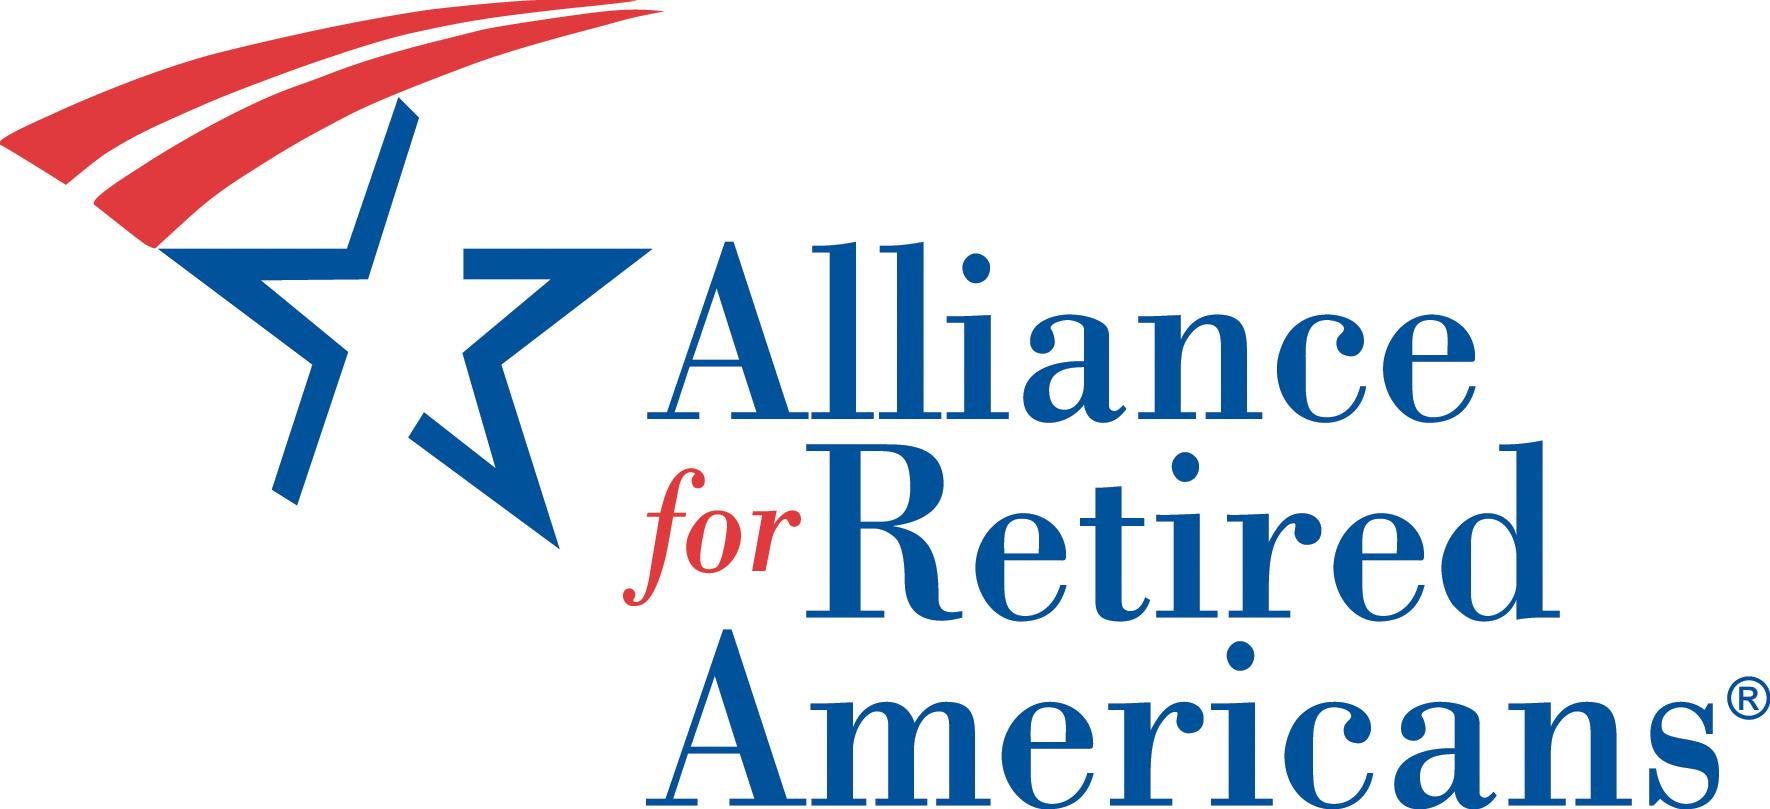 alliance_or_retired_americans.jpg